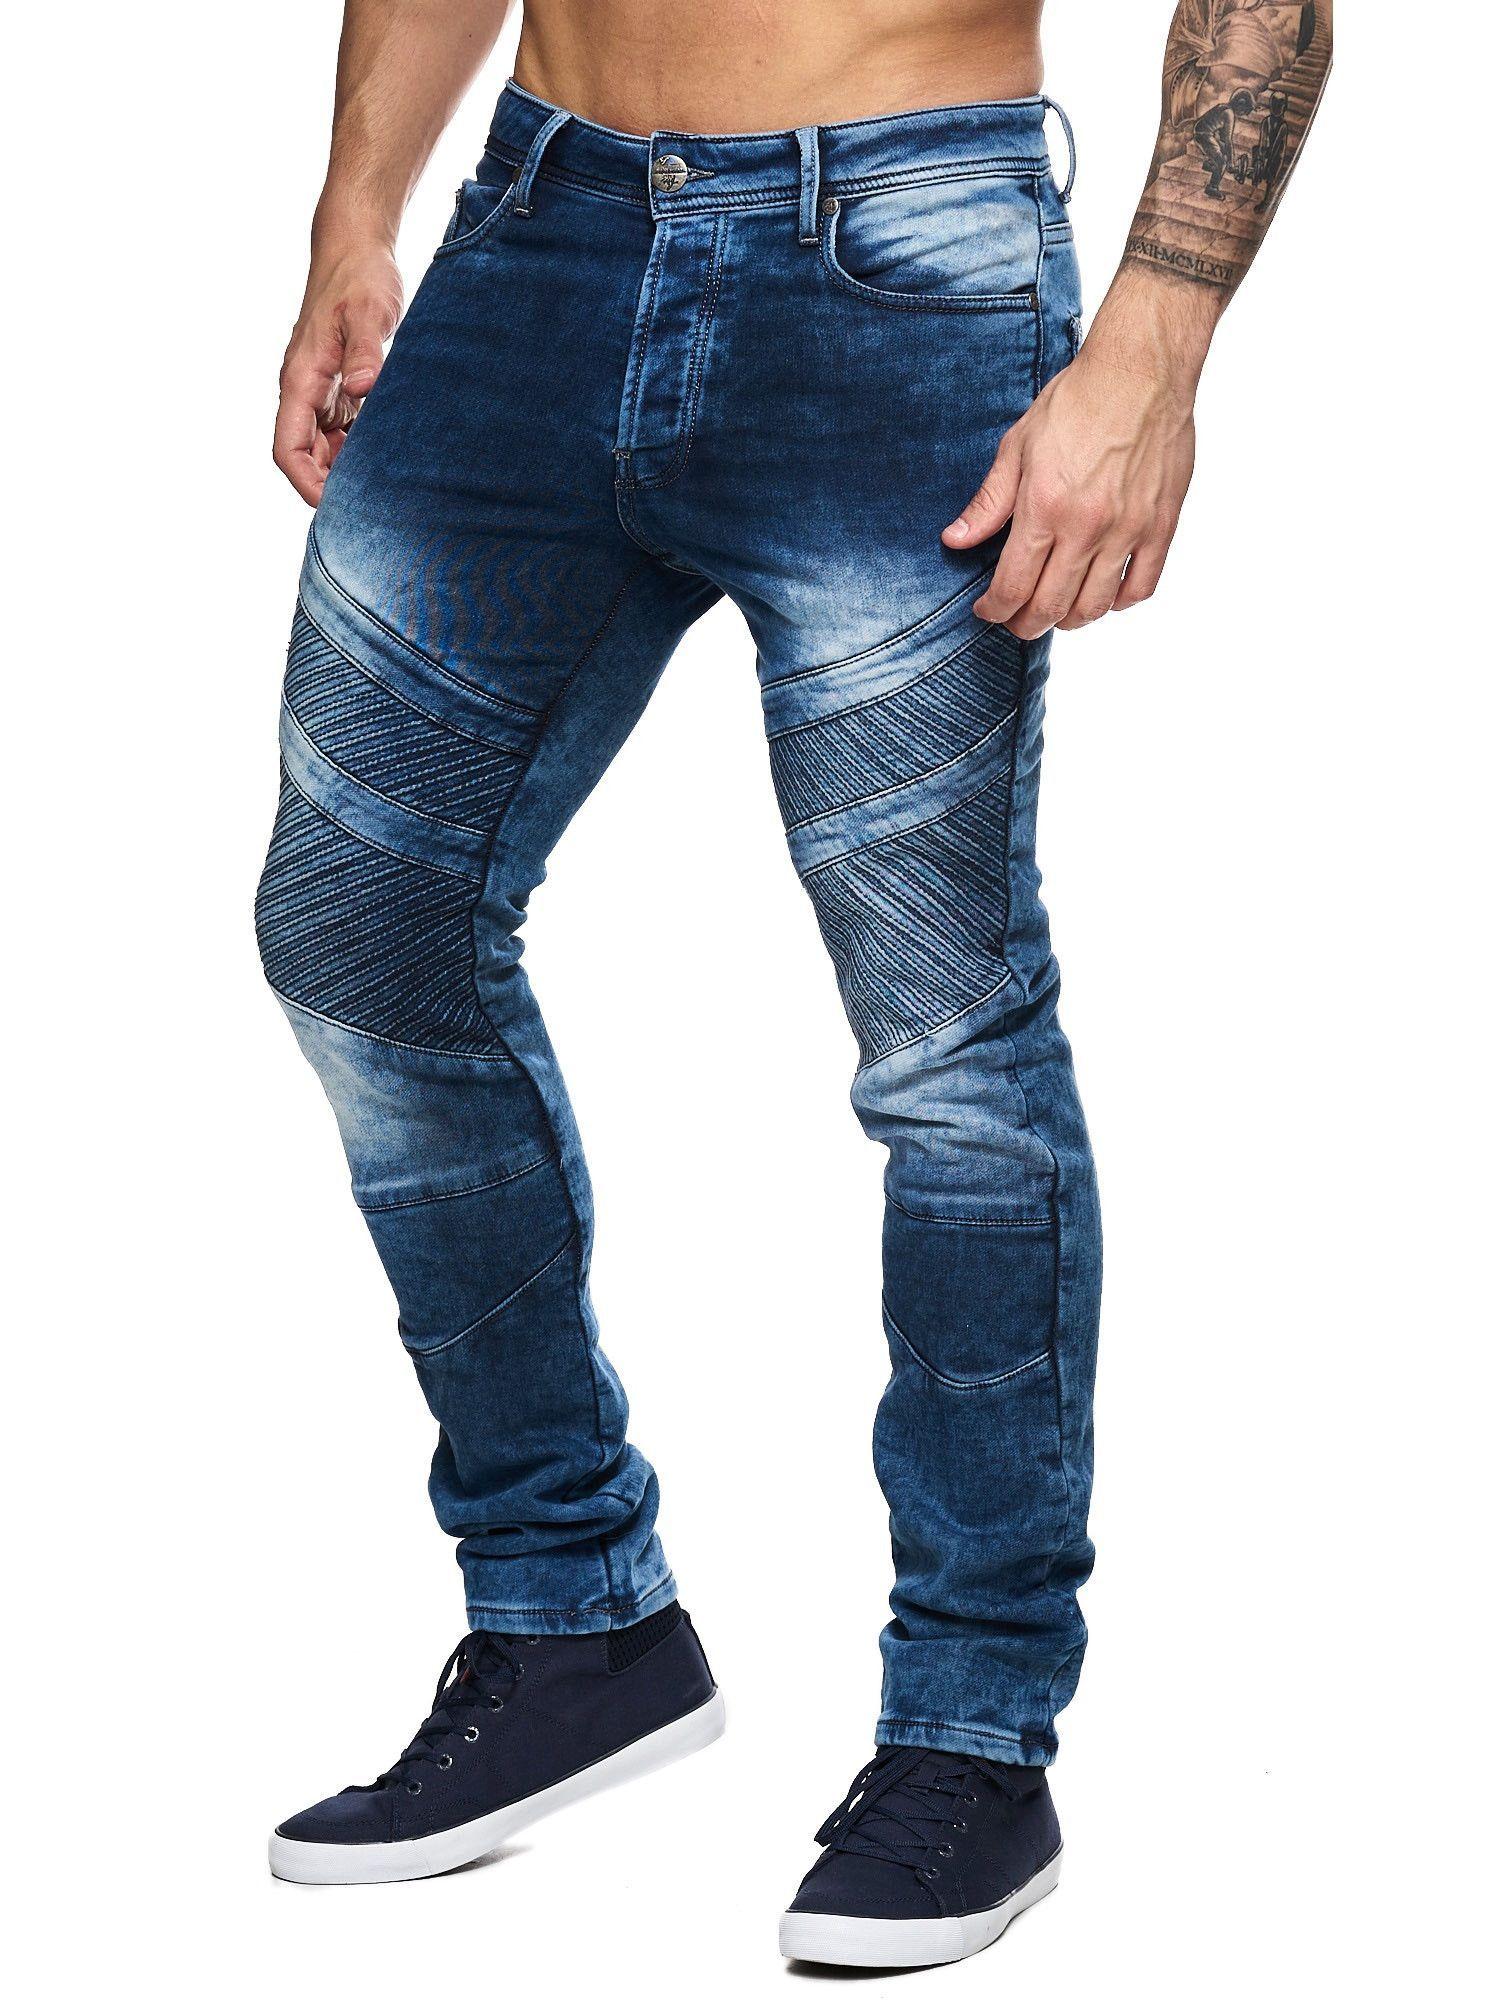 F&S Men Slim Fit Denim Power Biker Jeans - Washed Blue http://www